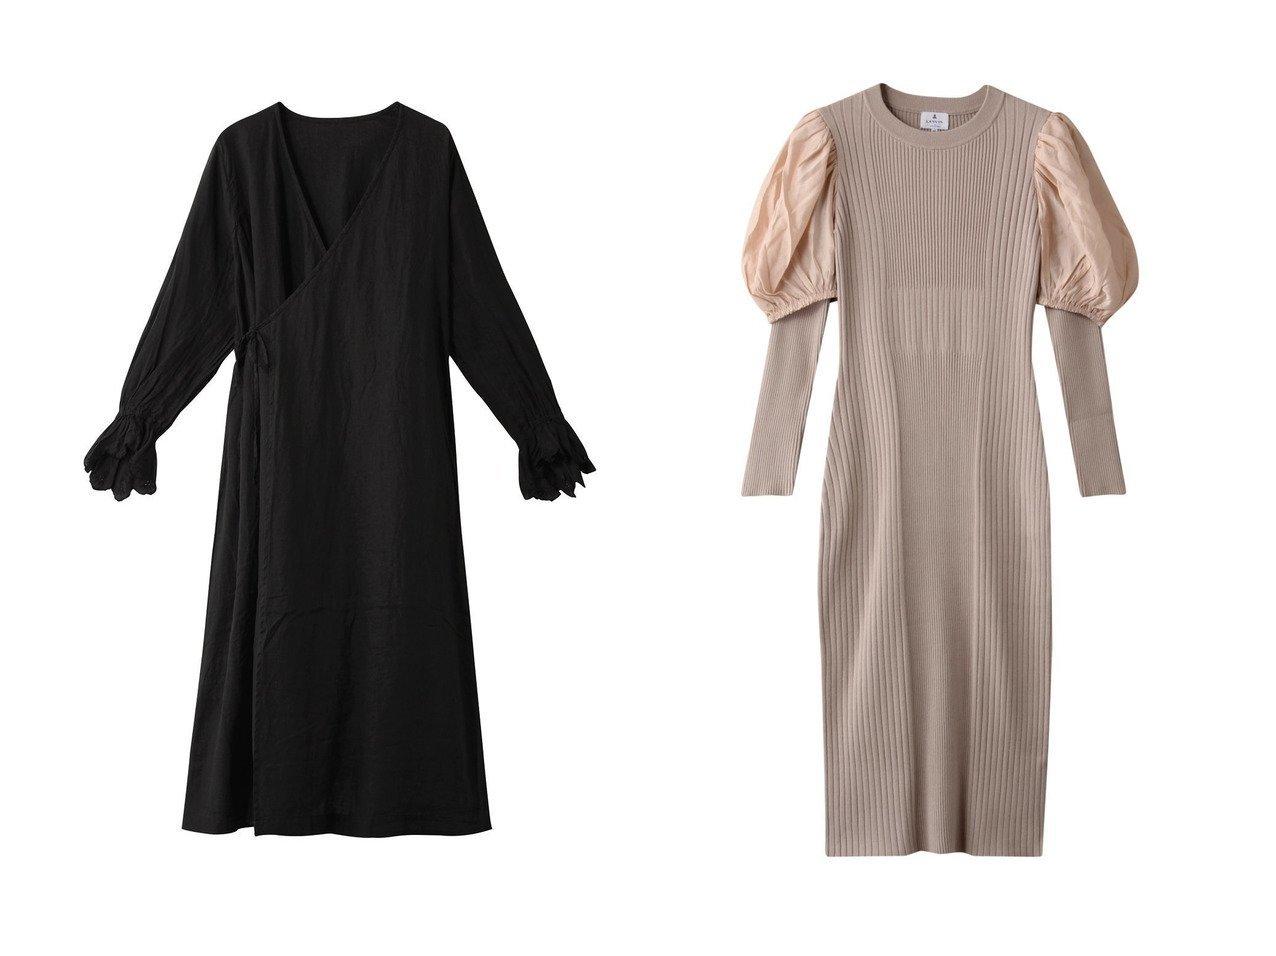 【LANVIN en Bleu/ランバン オン ブルー】のオーガンジースリーブニットワンピース&【nest Robe/ネストローブ】の-Li スカラップ刺繍ワンピース ワンピース・ドレスのおすすめ!人気、レディースファッションの通販  おすすめで人気のファッション通販商品 インテリア・家具・キッズファッション・メンズファッション・レディースファッション・服の通販 founy(ファニー) https://founy.com/ ファッション Fashion レディース WOMEN ワンピース Dress ニットワンピース Knit Dresses シンプル スカラップ ロング 秋 アクセサリー オーガンジー クラシカル スリーブ トレンド  ID:crp329100000000704